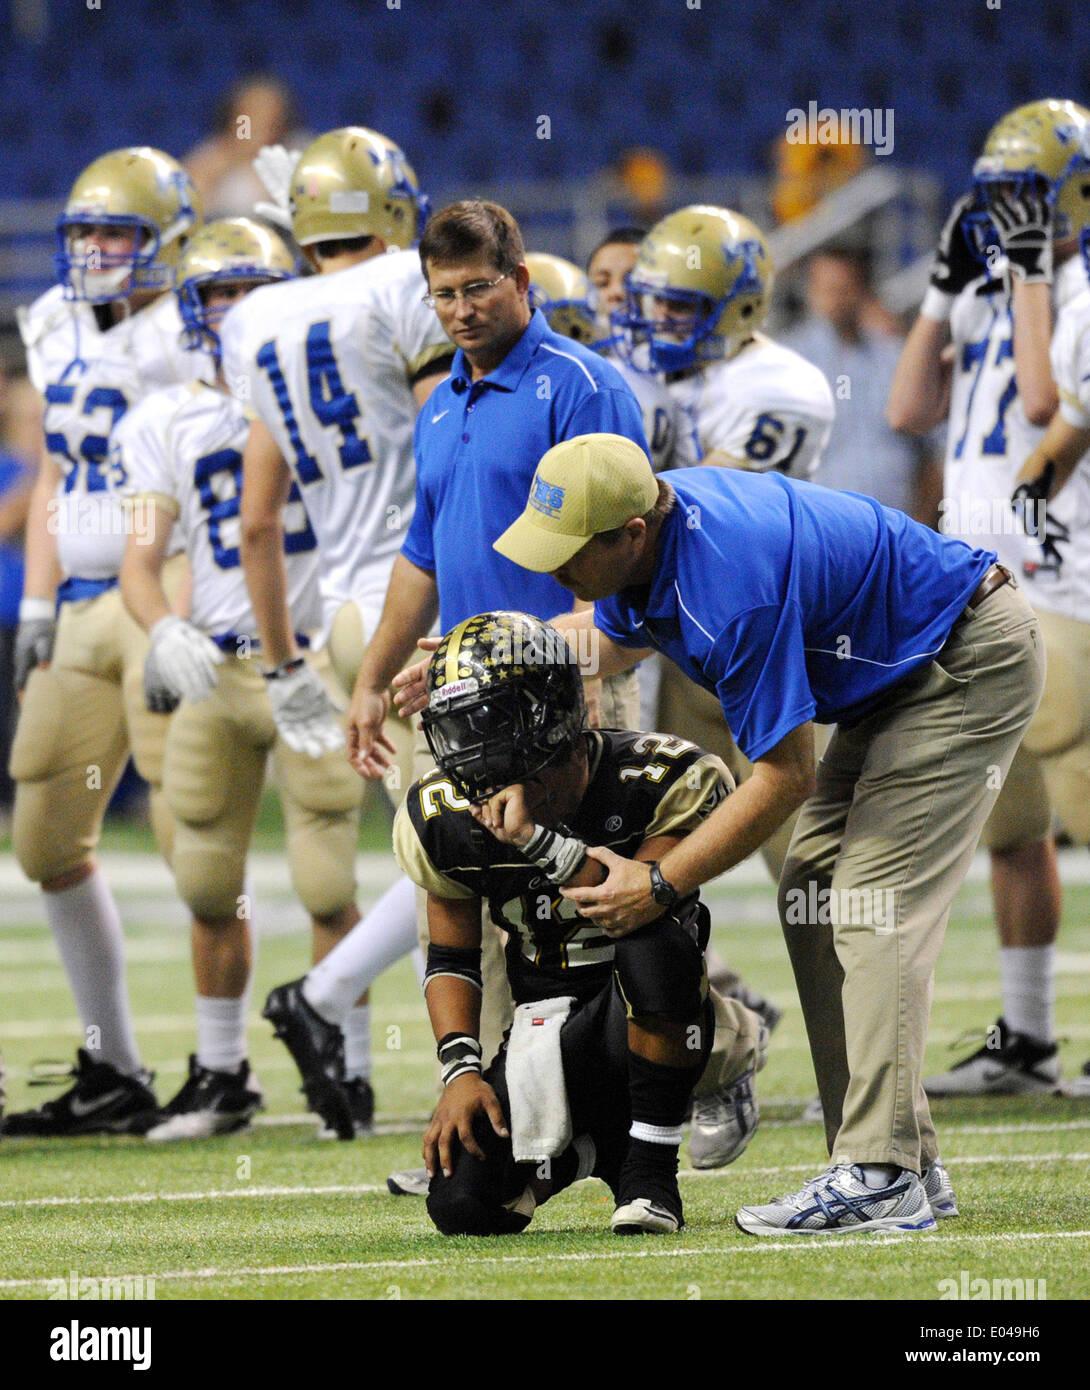 San Antonio, Texas, USA. 25th Nov, 2011. Kerrville Tivy athletic director MARK SMITH comforts Port Lavaca Calhoun Stock Photo